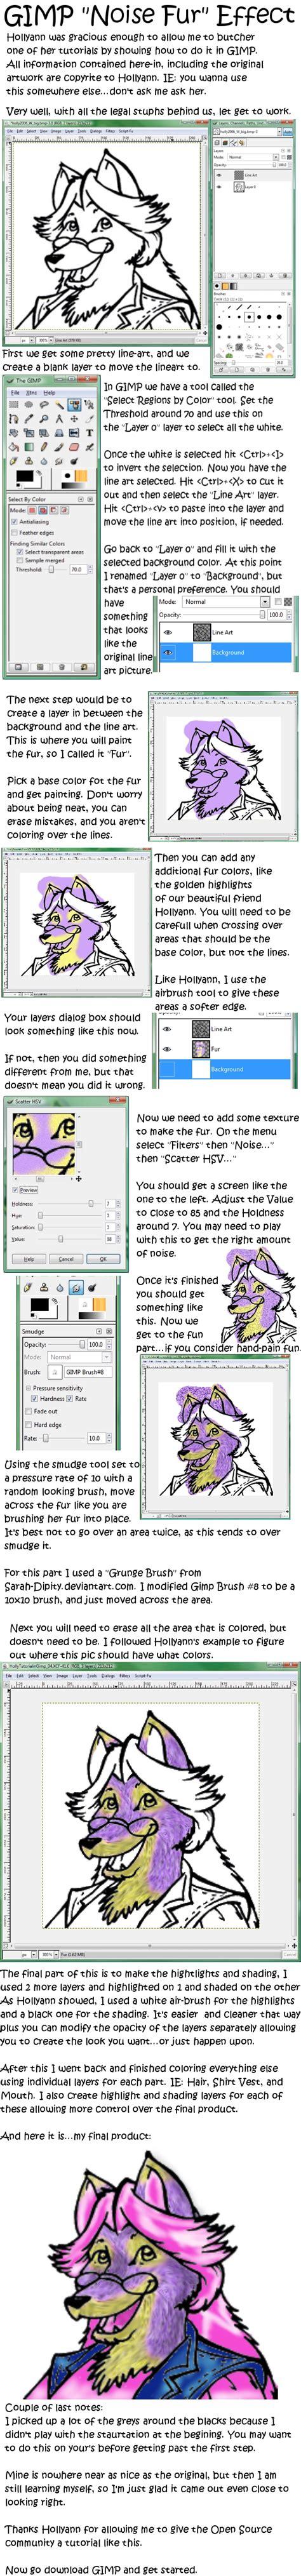 newsprint effect basics gimp by tgfcoder on deviantart gimp noise fur effect tutorial by eaglesf on deviantart